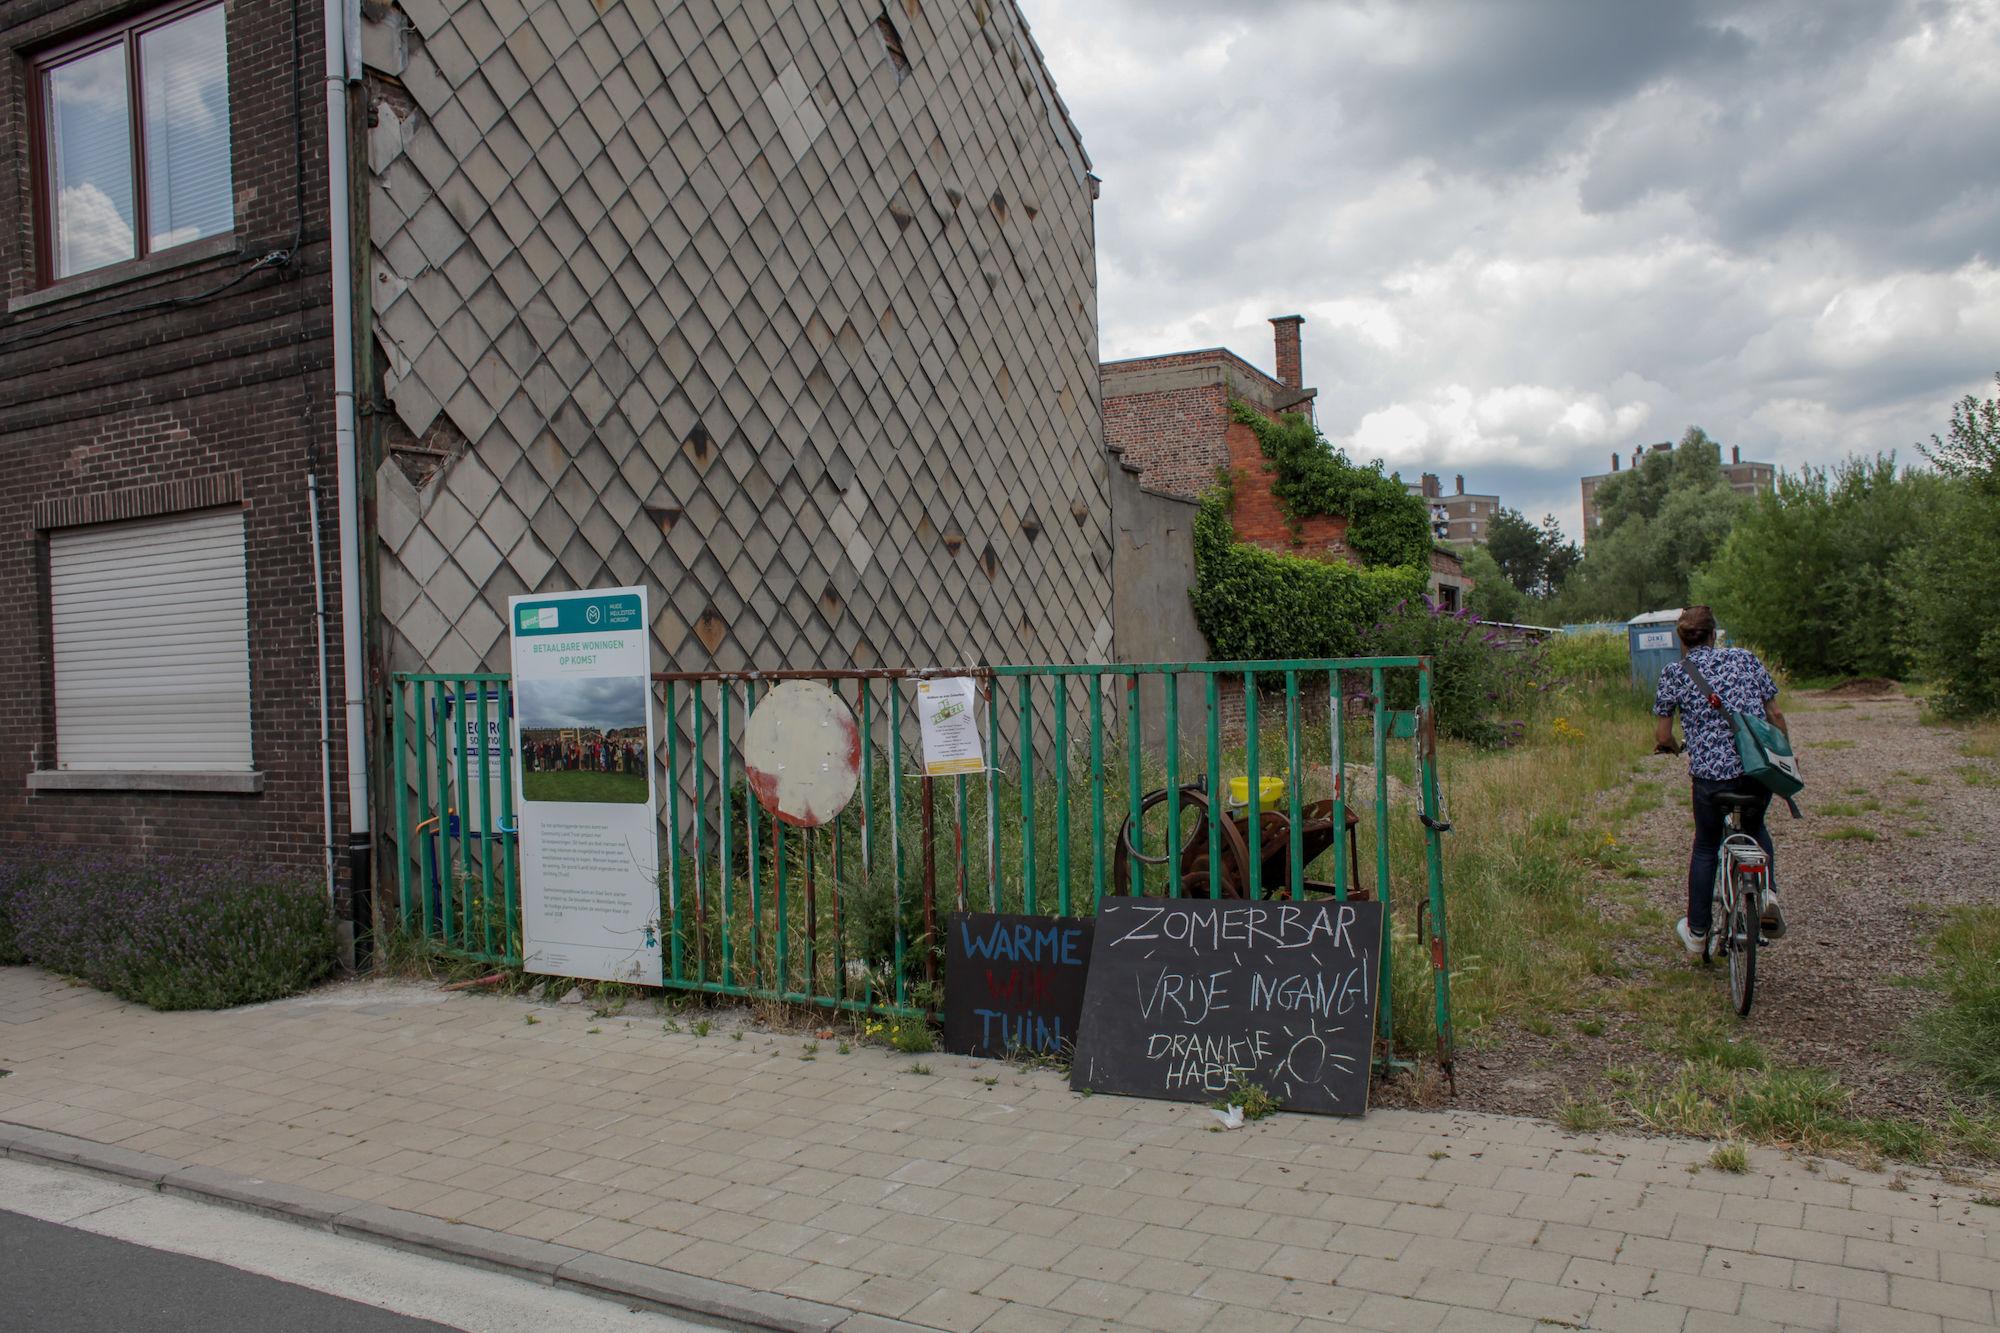 2019-07-02 Muide Meulestede prospectie Wannes_stadsvernieuwing_IMG_0329-2.jpg